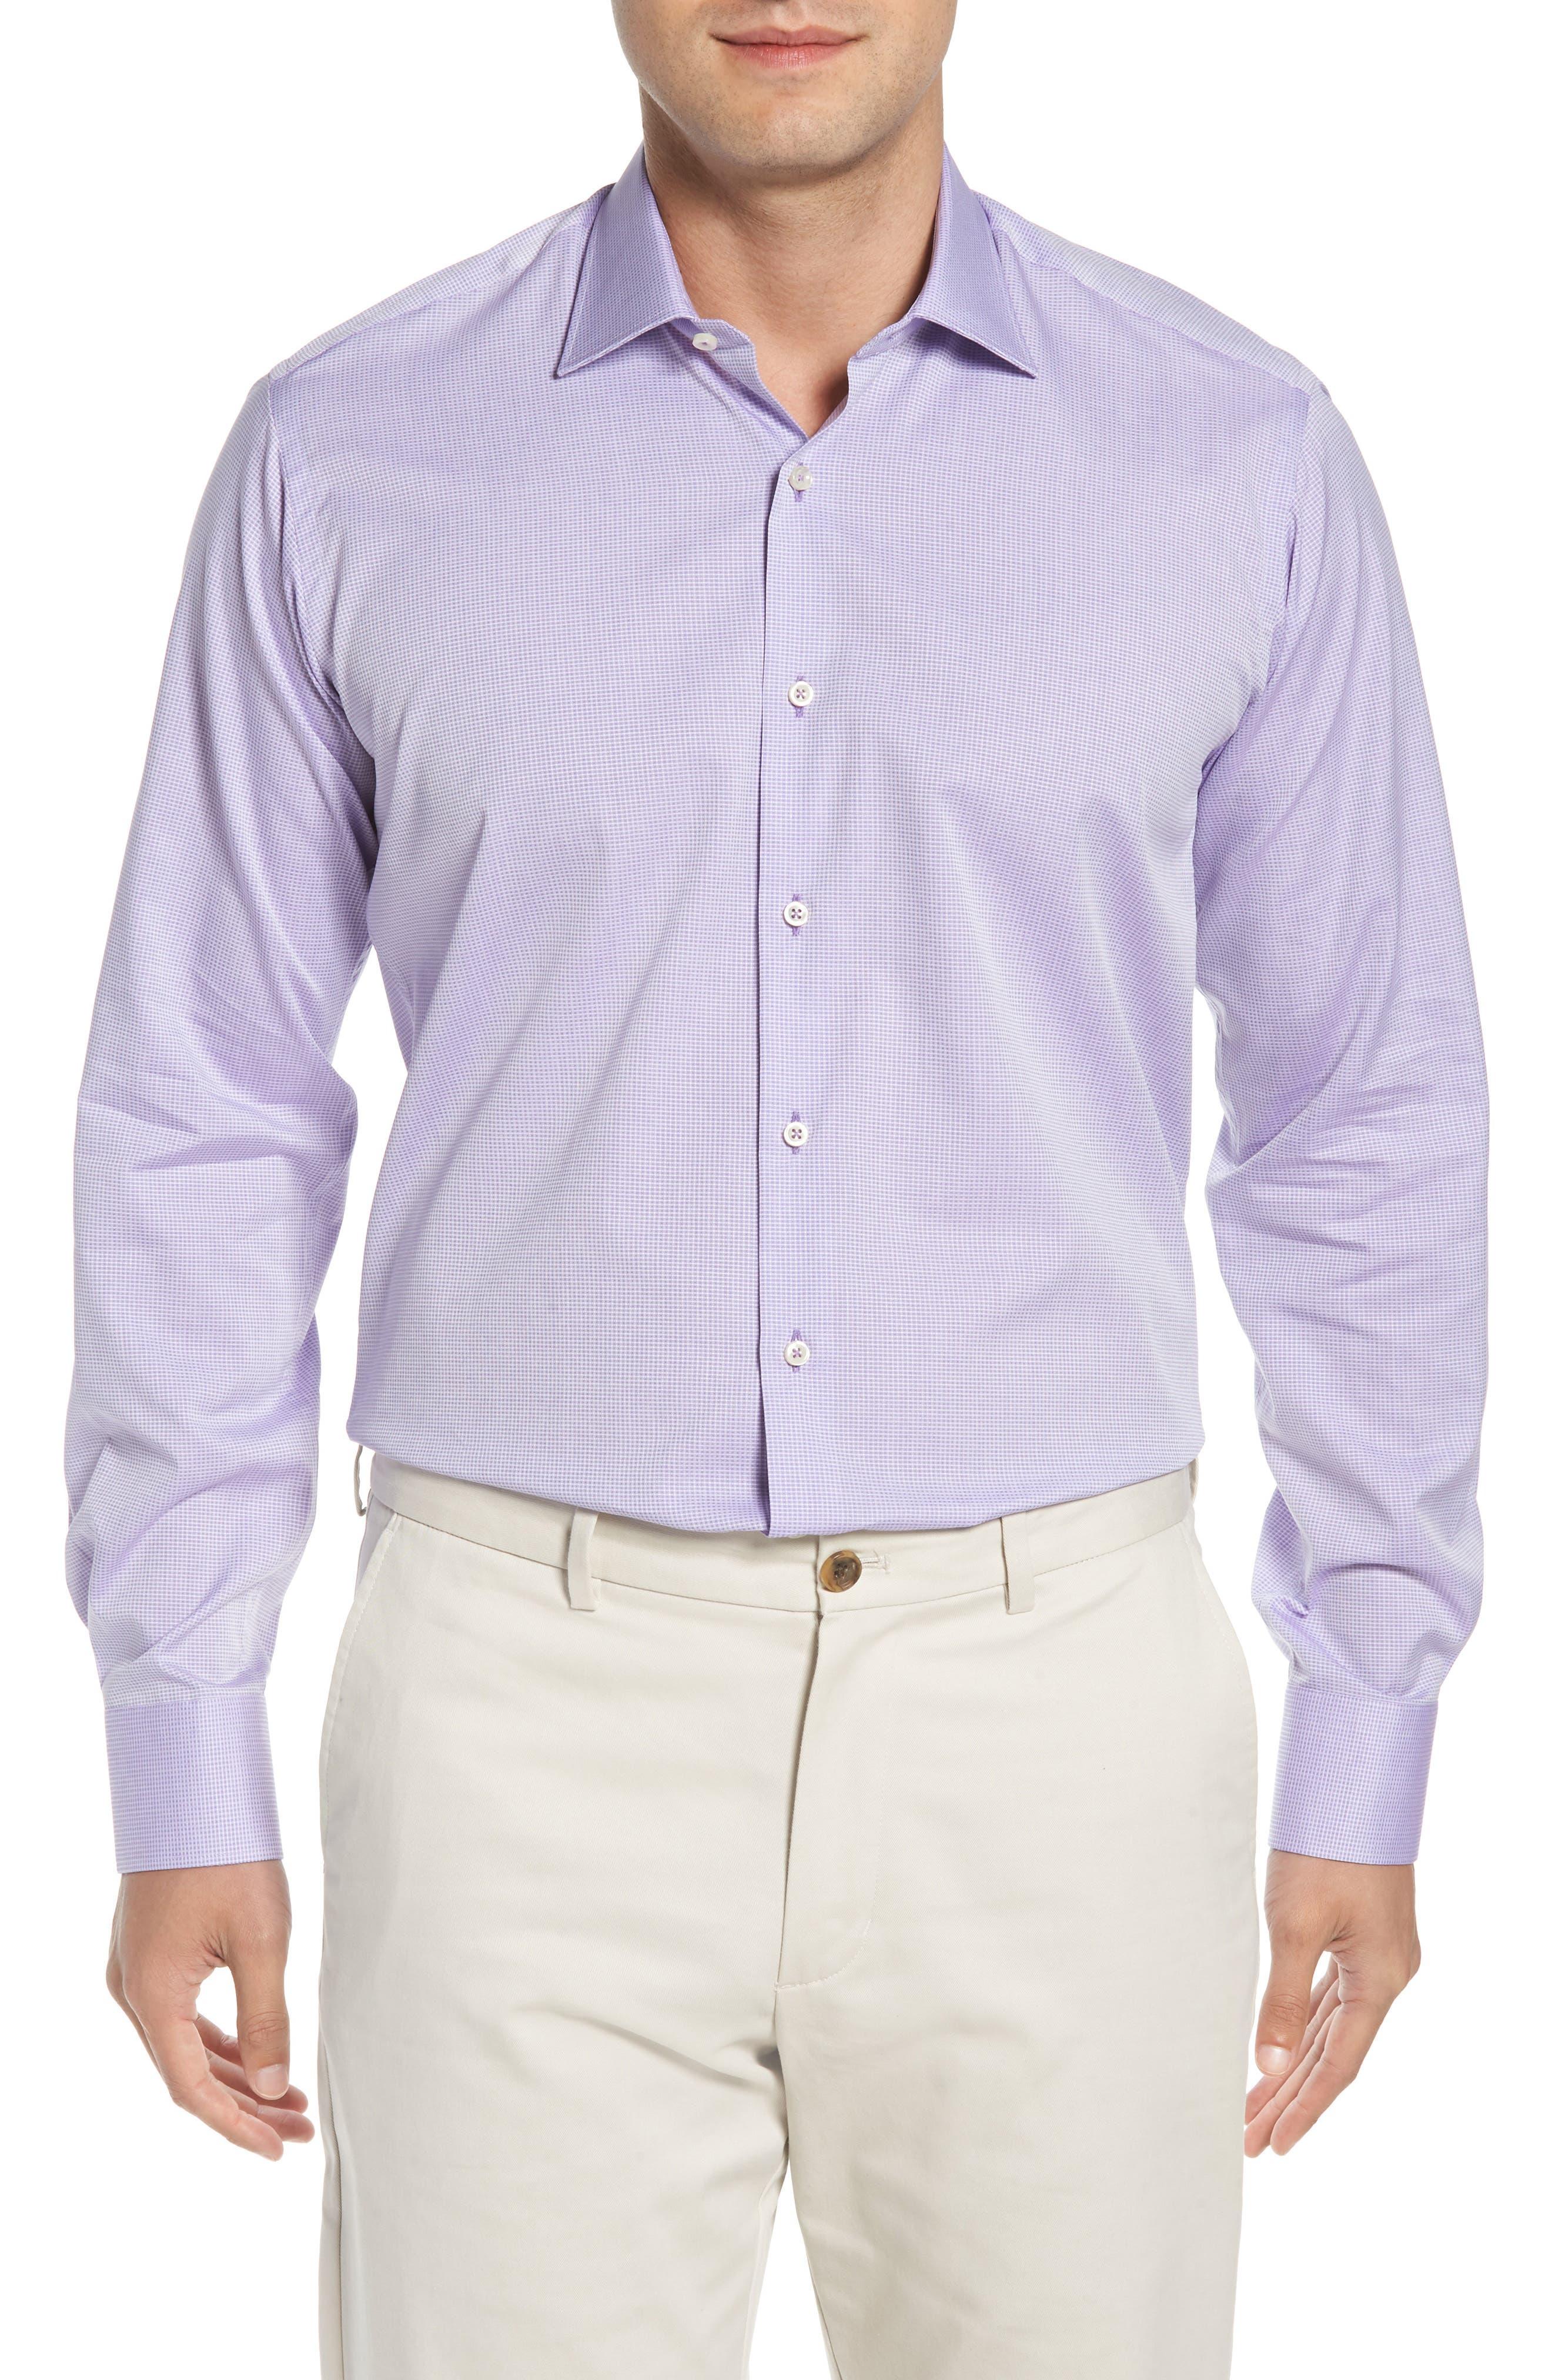 Regular Fit Solid Dress Shirt,                             Main thumbnail 1, color,                             500